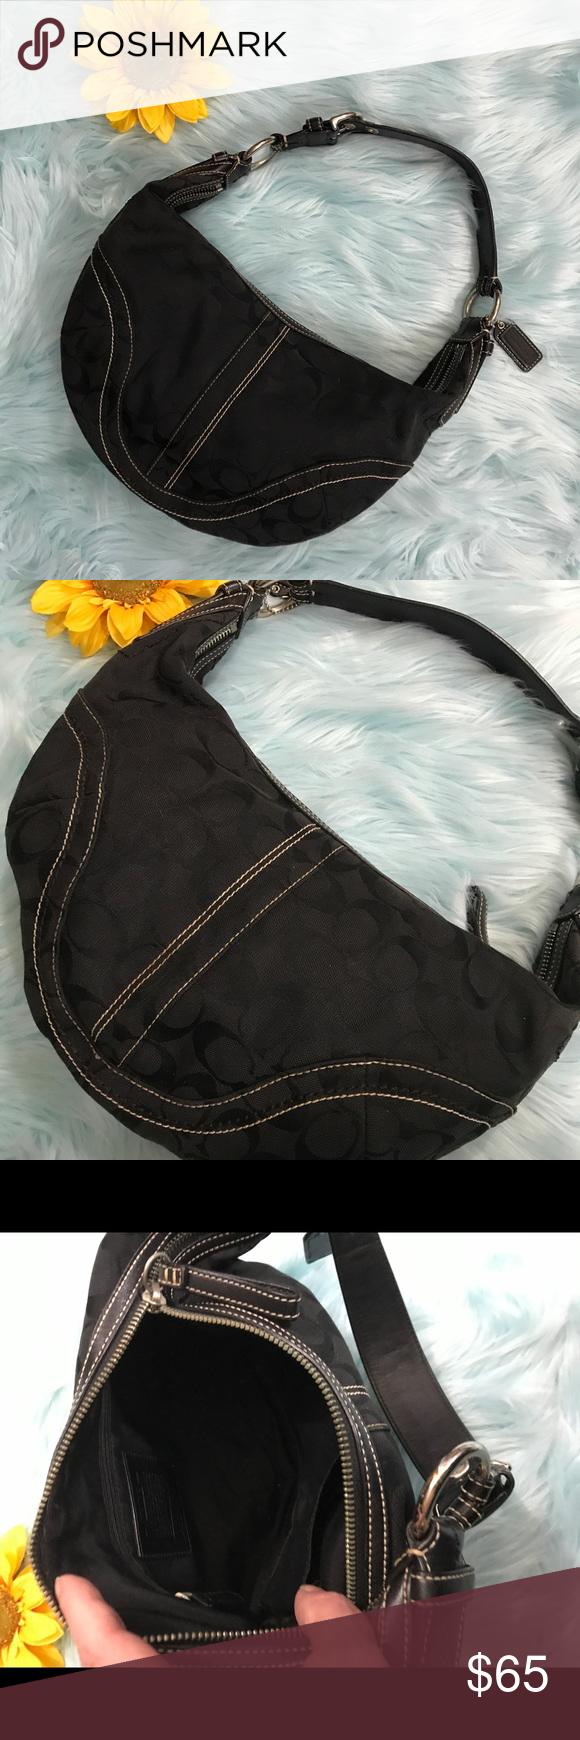 f0c0d2a02c3 Spotted while shopping on Poshmark  Coach Black Canvas Signature Leather  Soho Hobo bag!  poshmark  fashion  shopping  style  Coach  Handbags